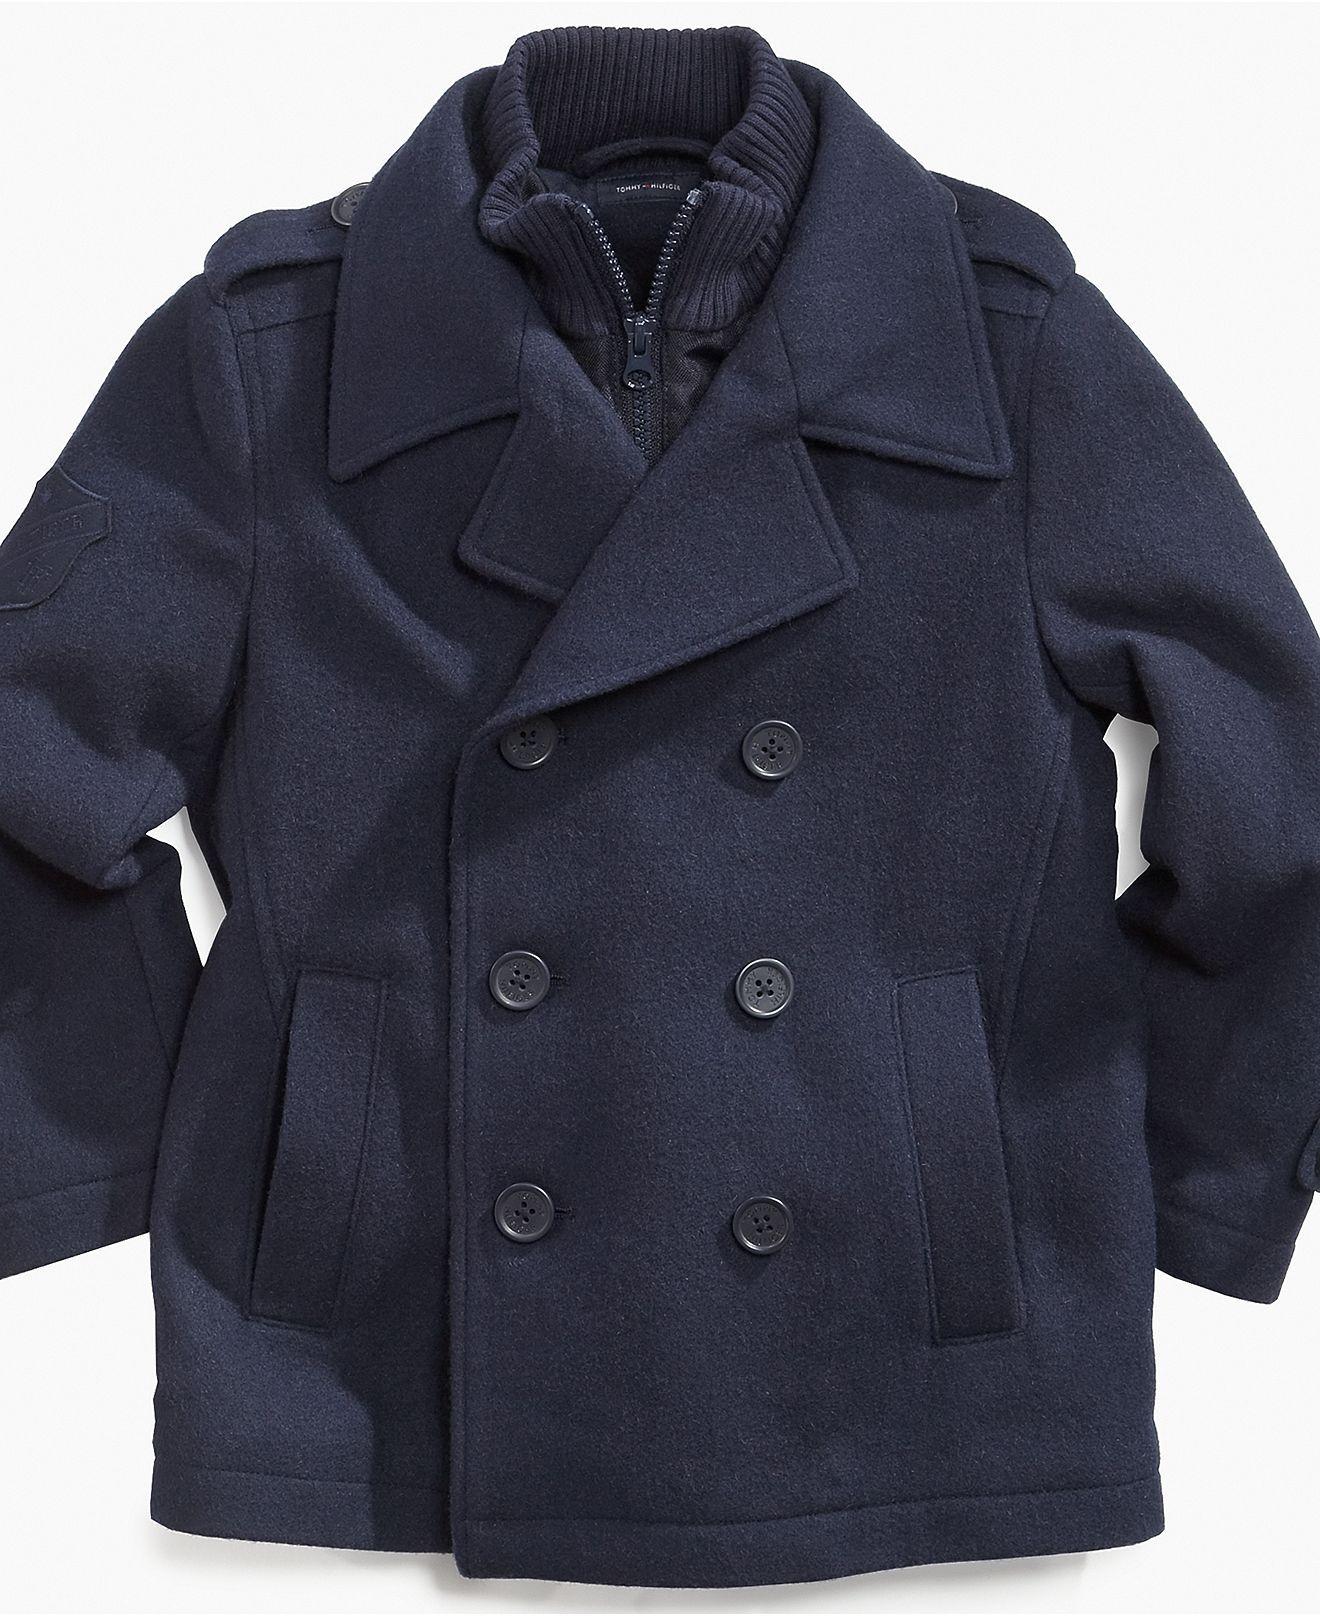 d05563ed8 Tommy Hilfiger Kids Coat